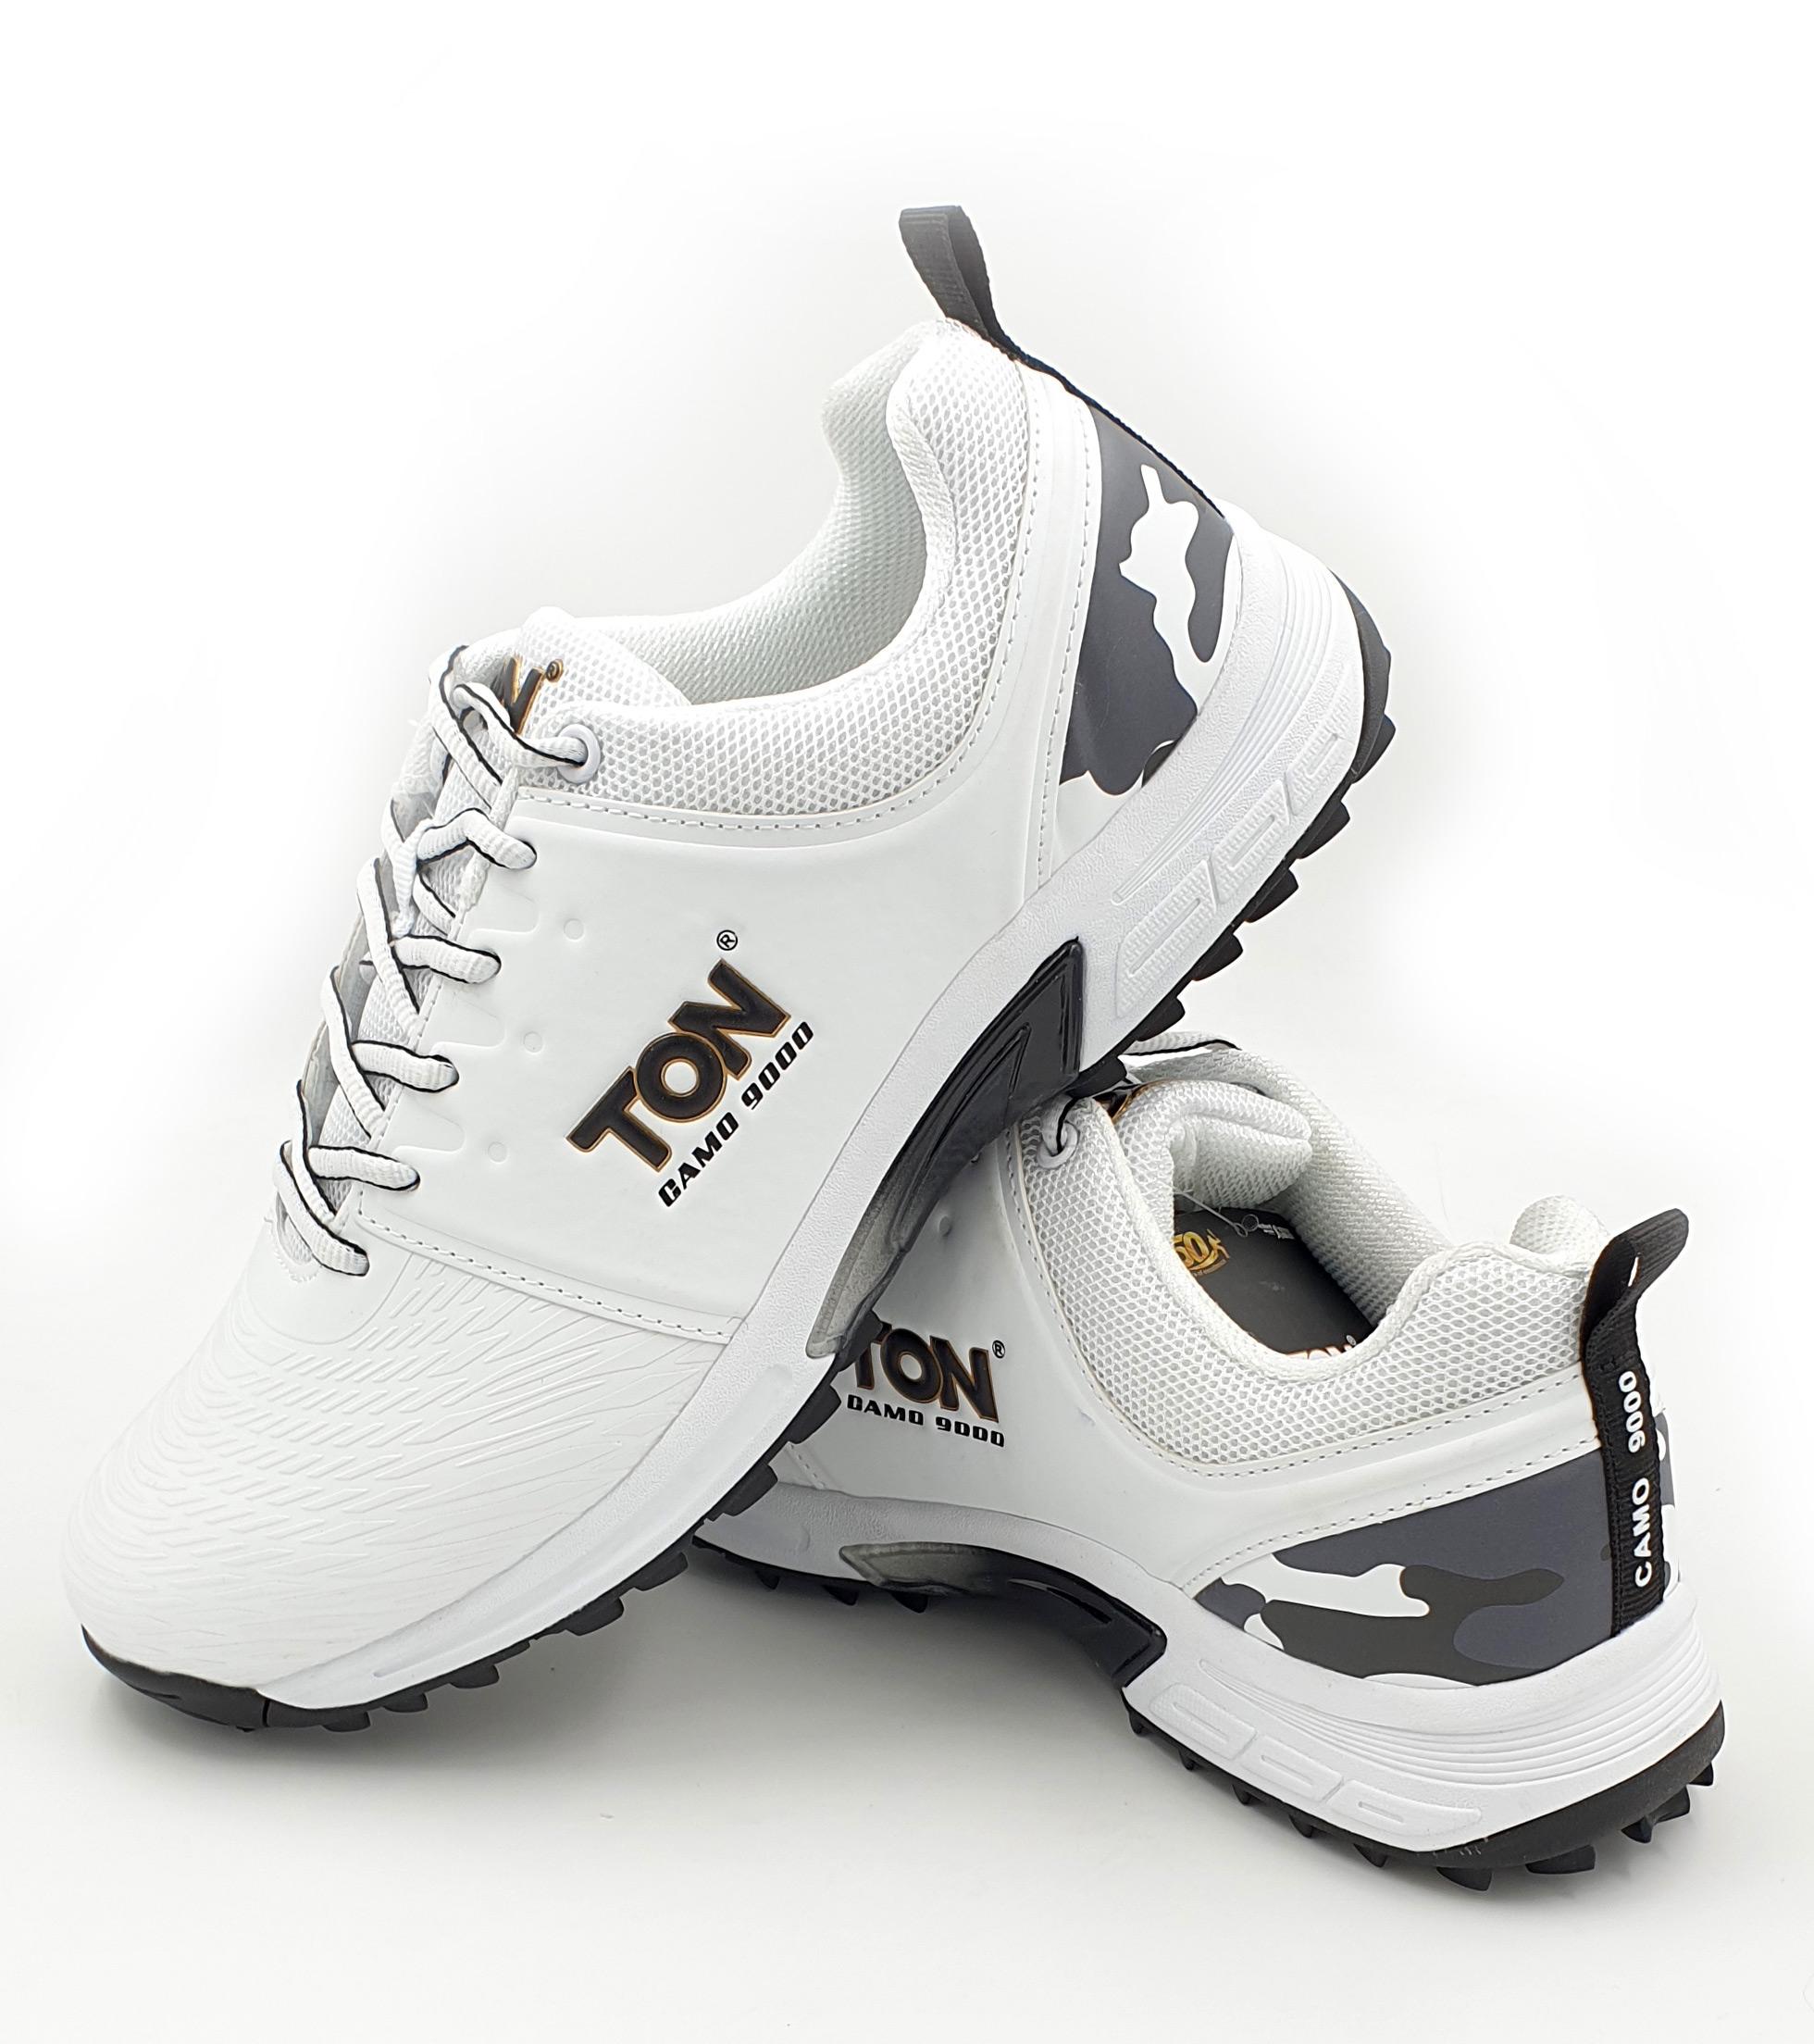 Buy SS Camo 9000 Cricket Shoes - 2020